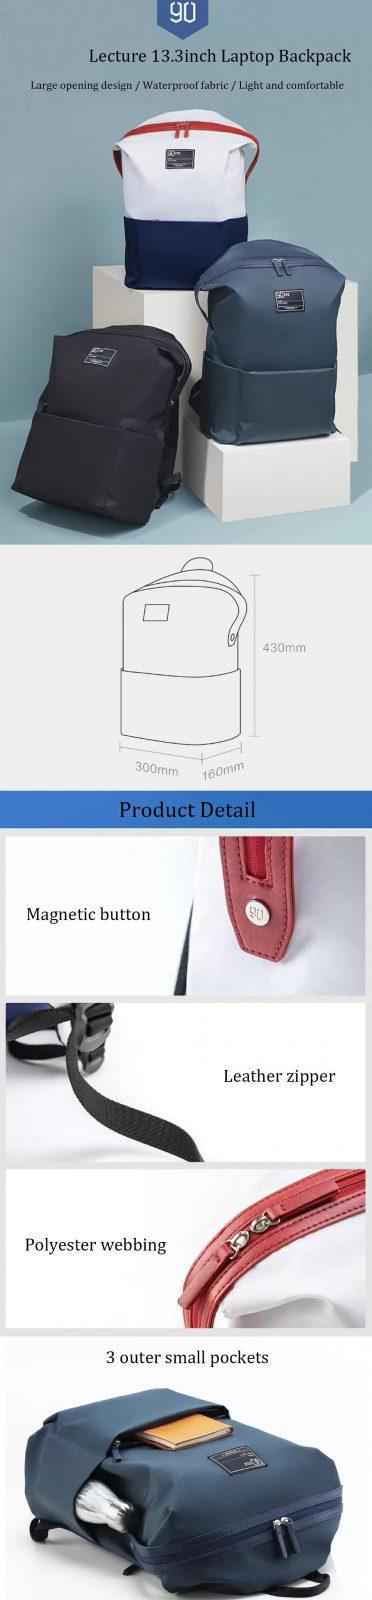 Xiaomi 90 Fun Lecturer Leisure Nylon Waterproof Backpack (2)